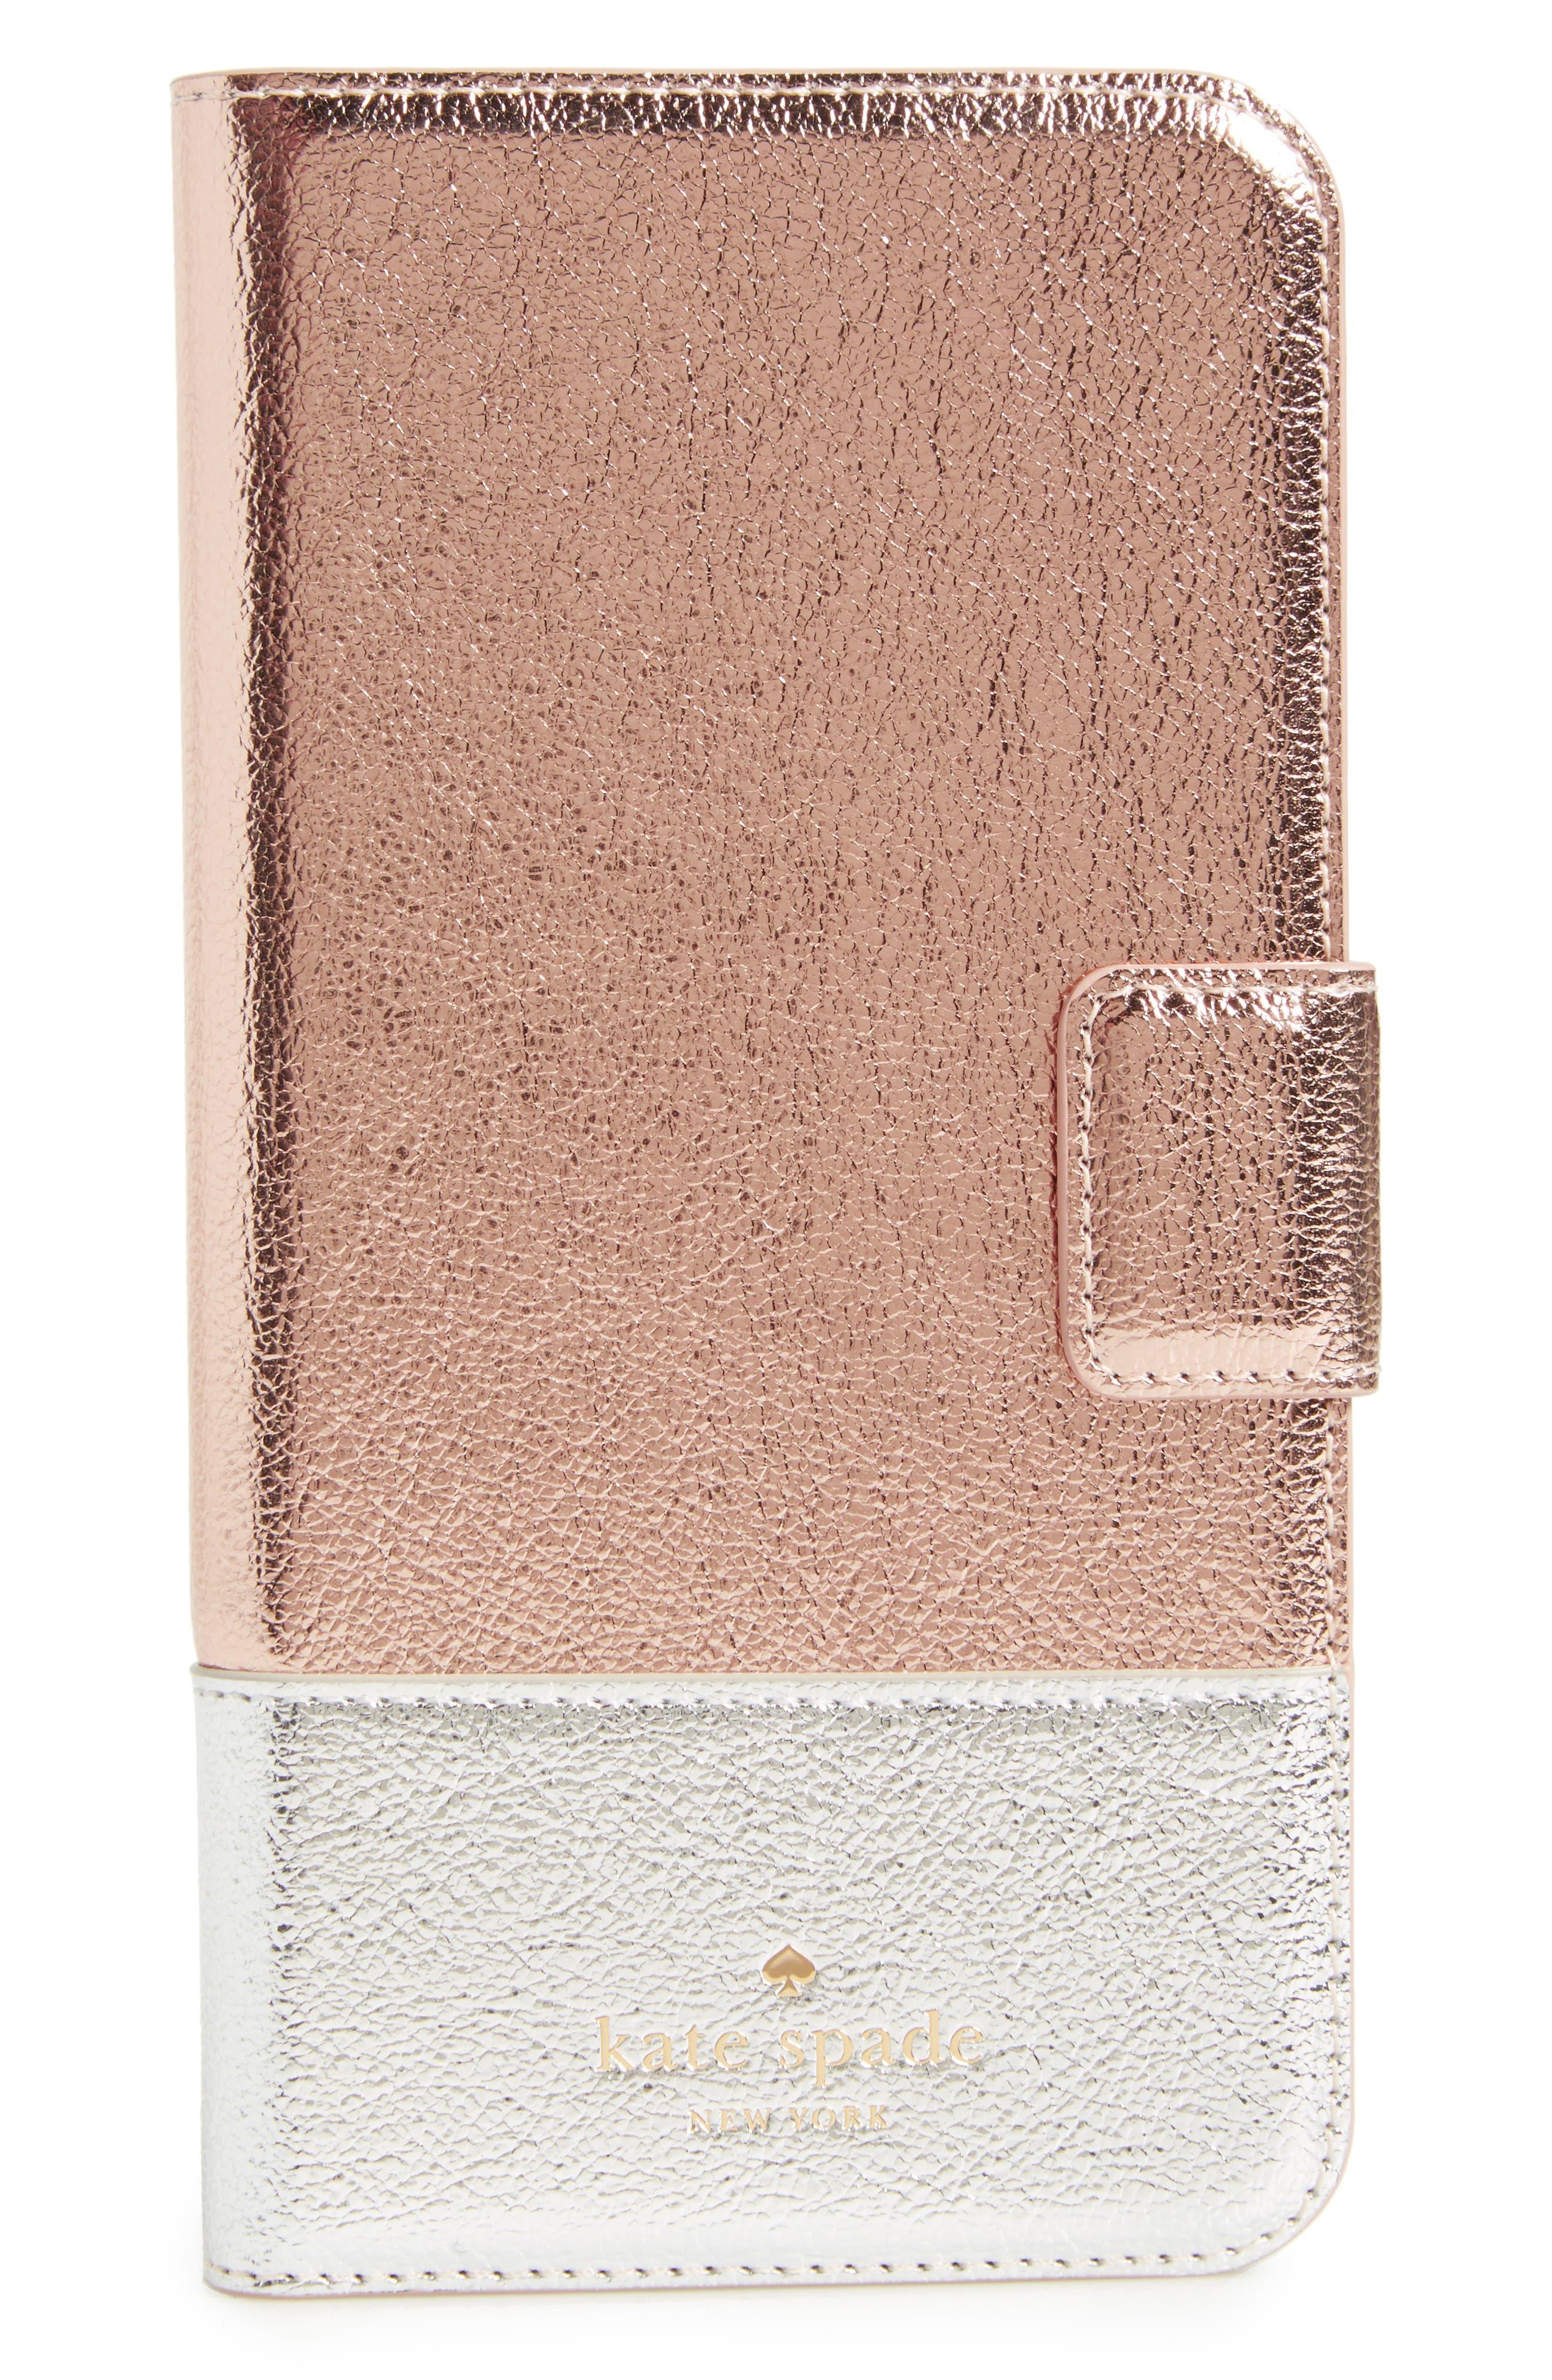 kate spade new york metallic leather iPhone 7 & 7 Plus folio